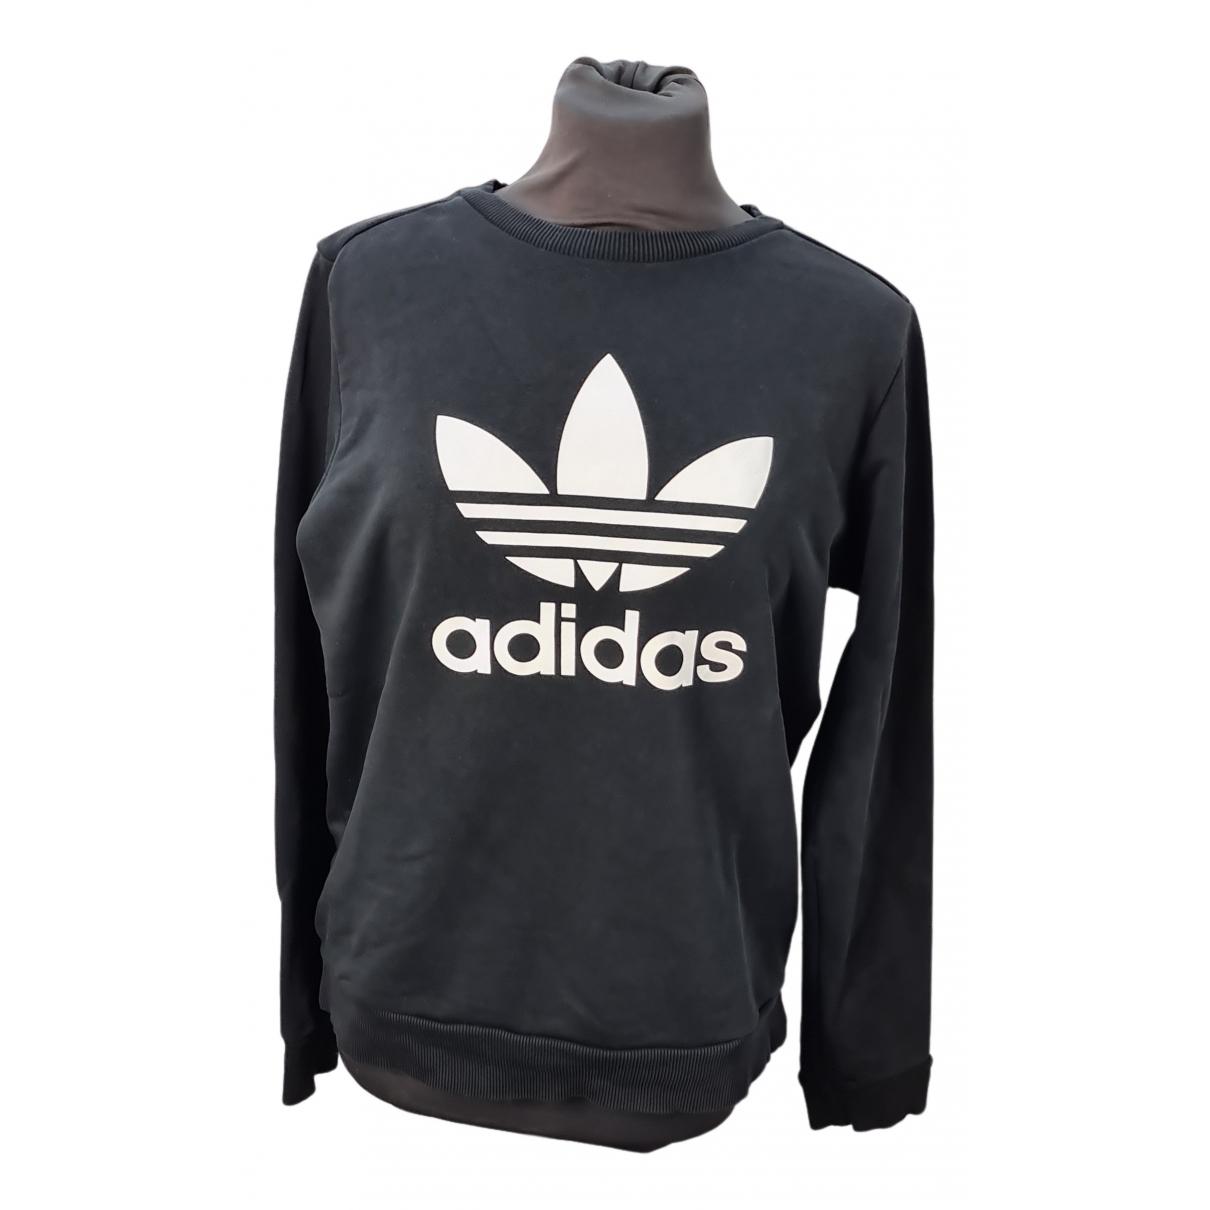 Adidas N Black Cotton Knitwear for Women M International